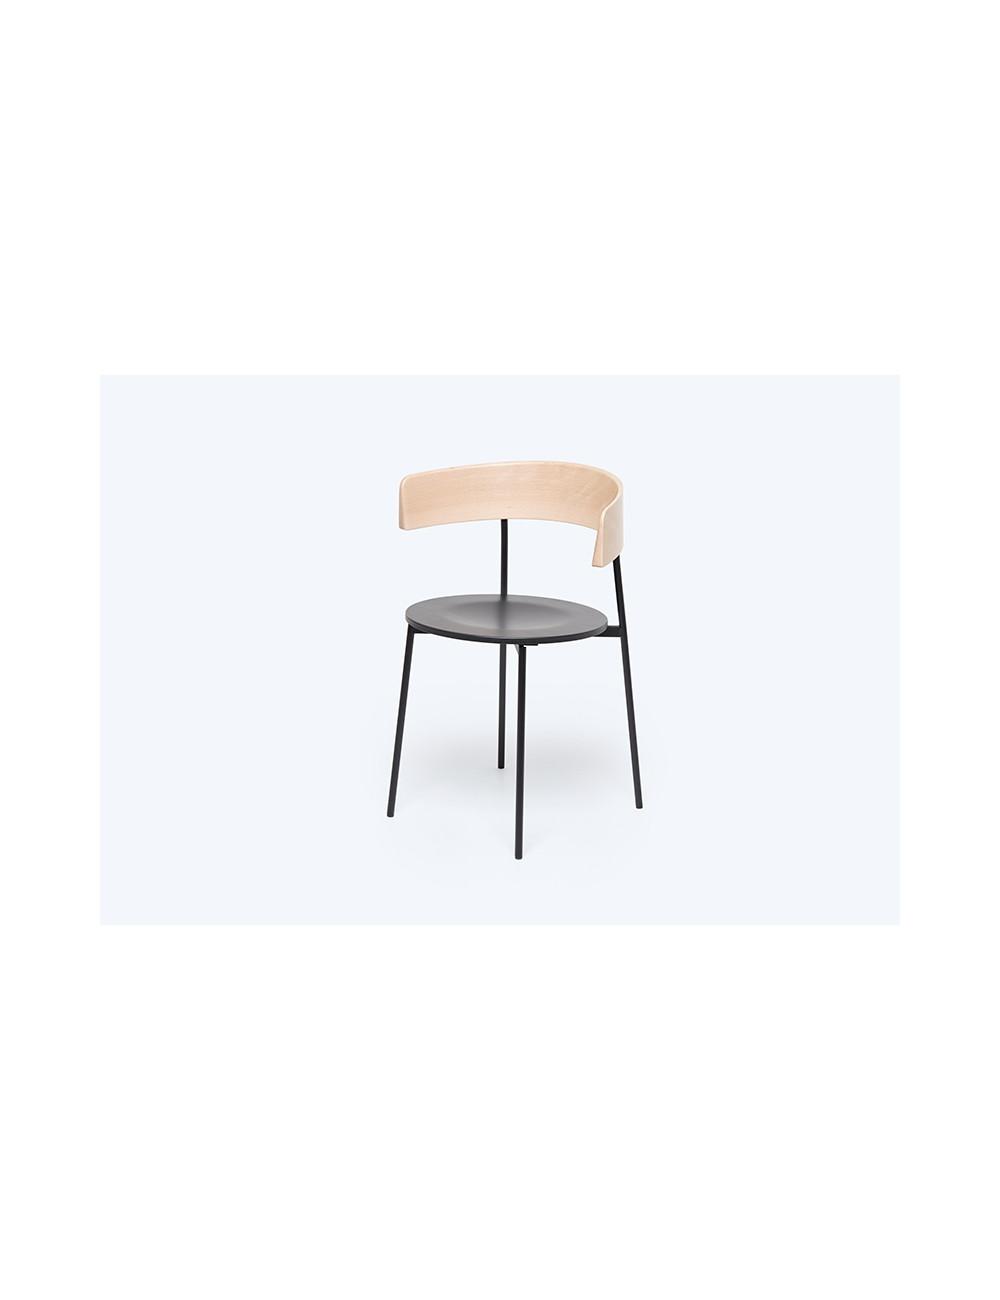 Stoel Friday Dining Chair   zwart/hout/met armen